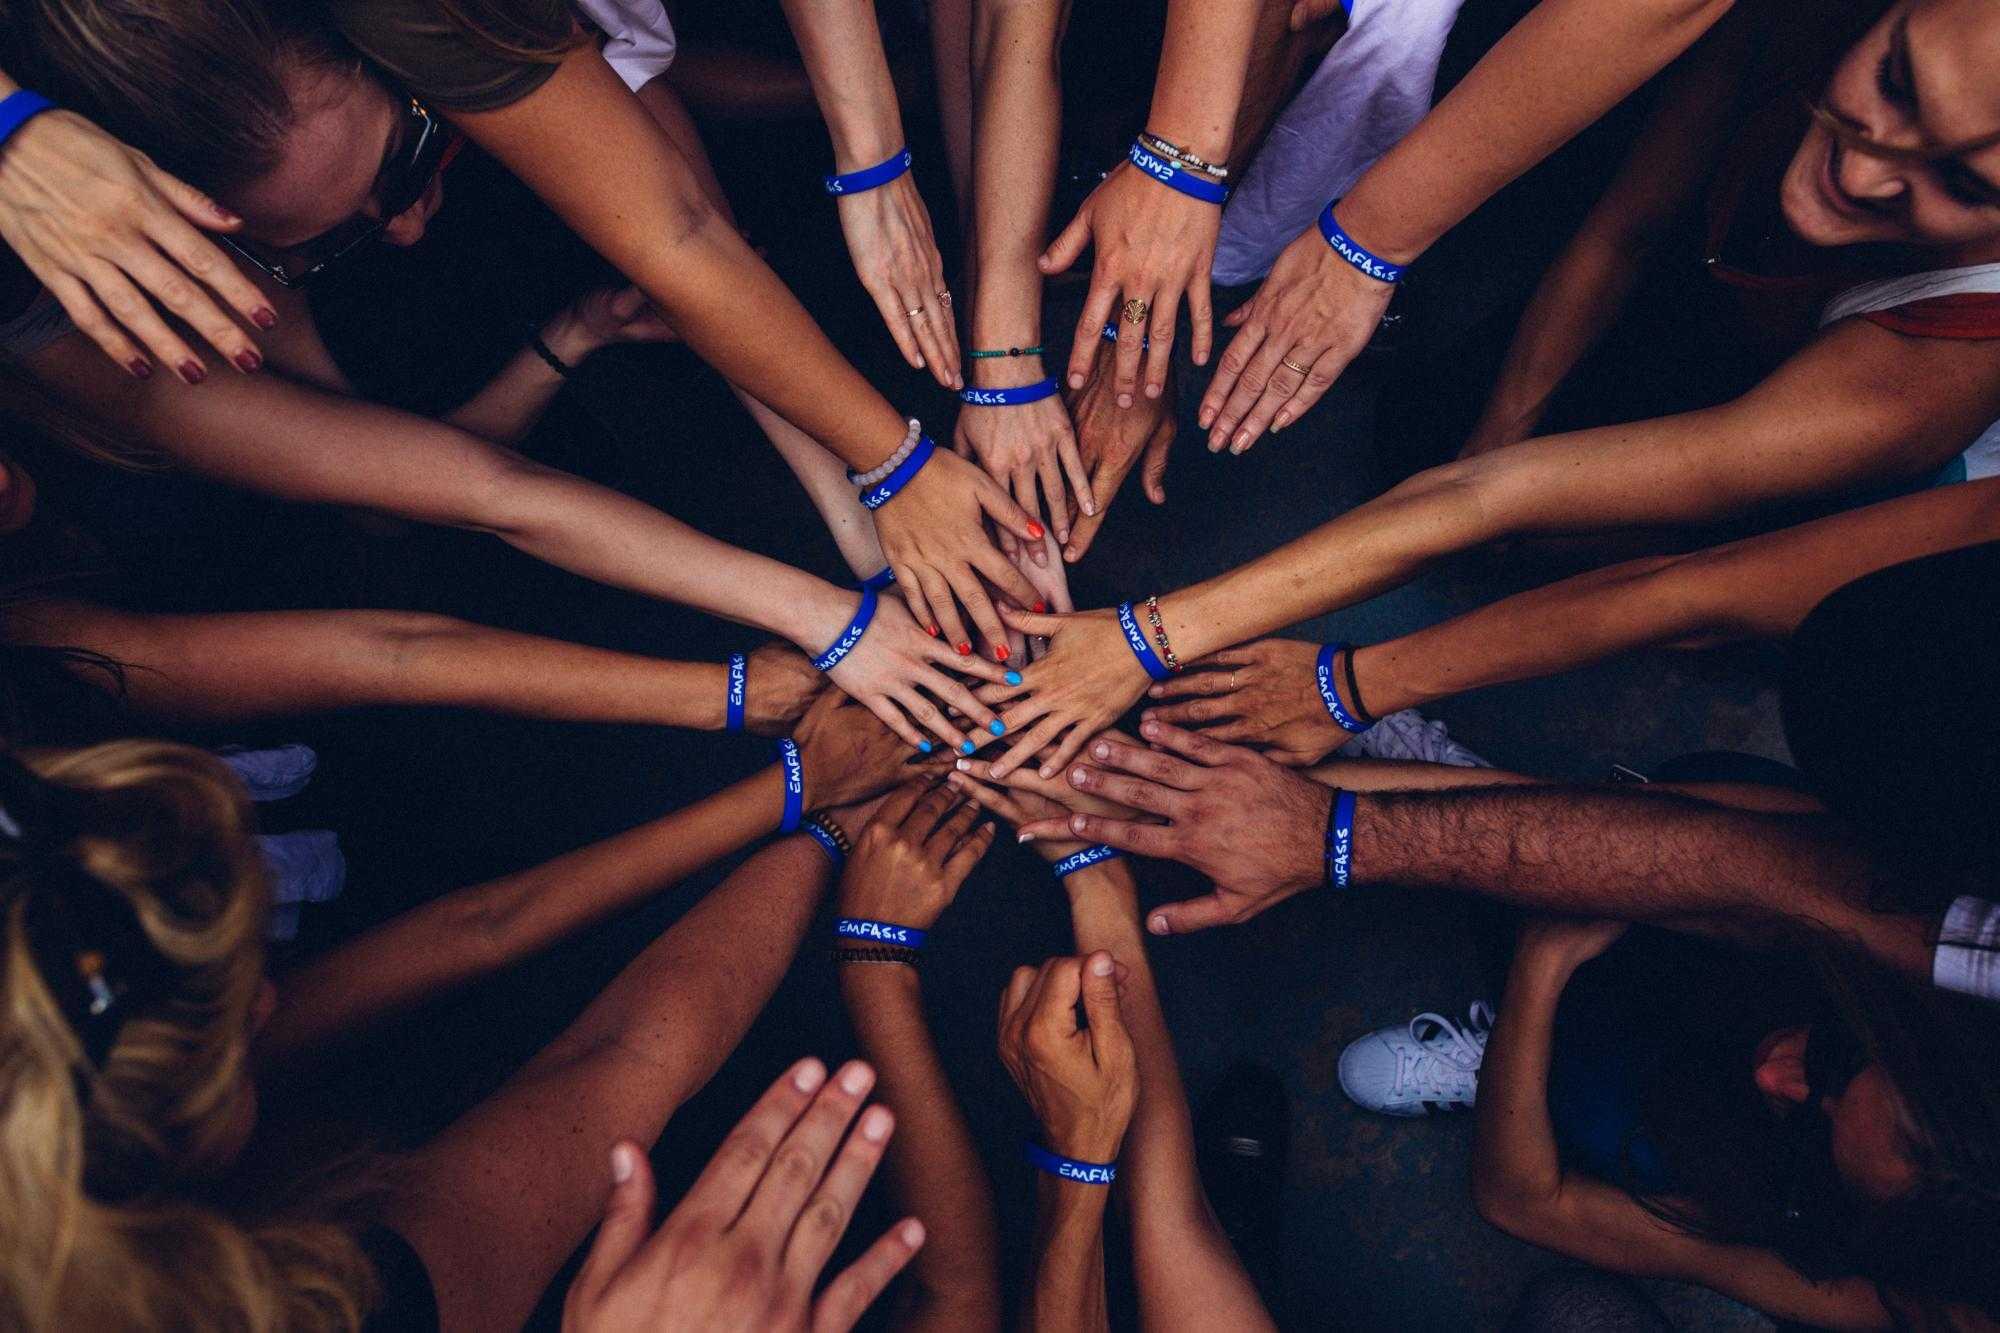 Group homogeneity